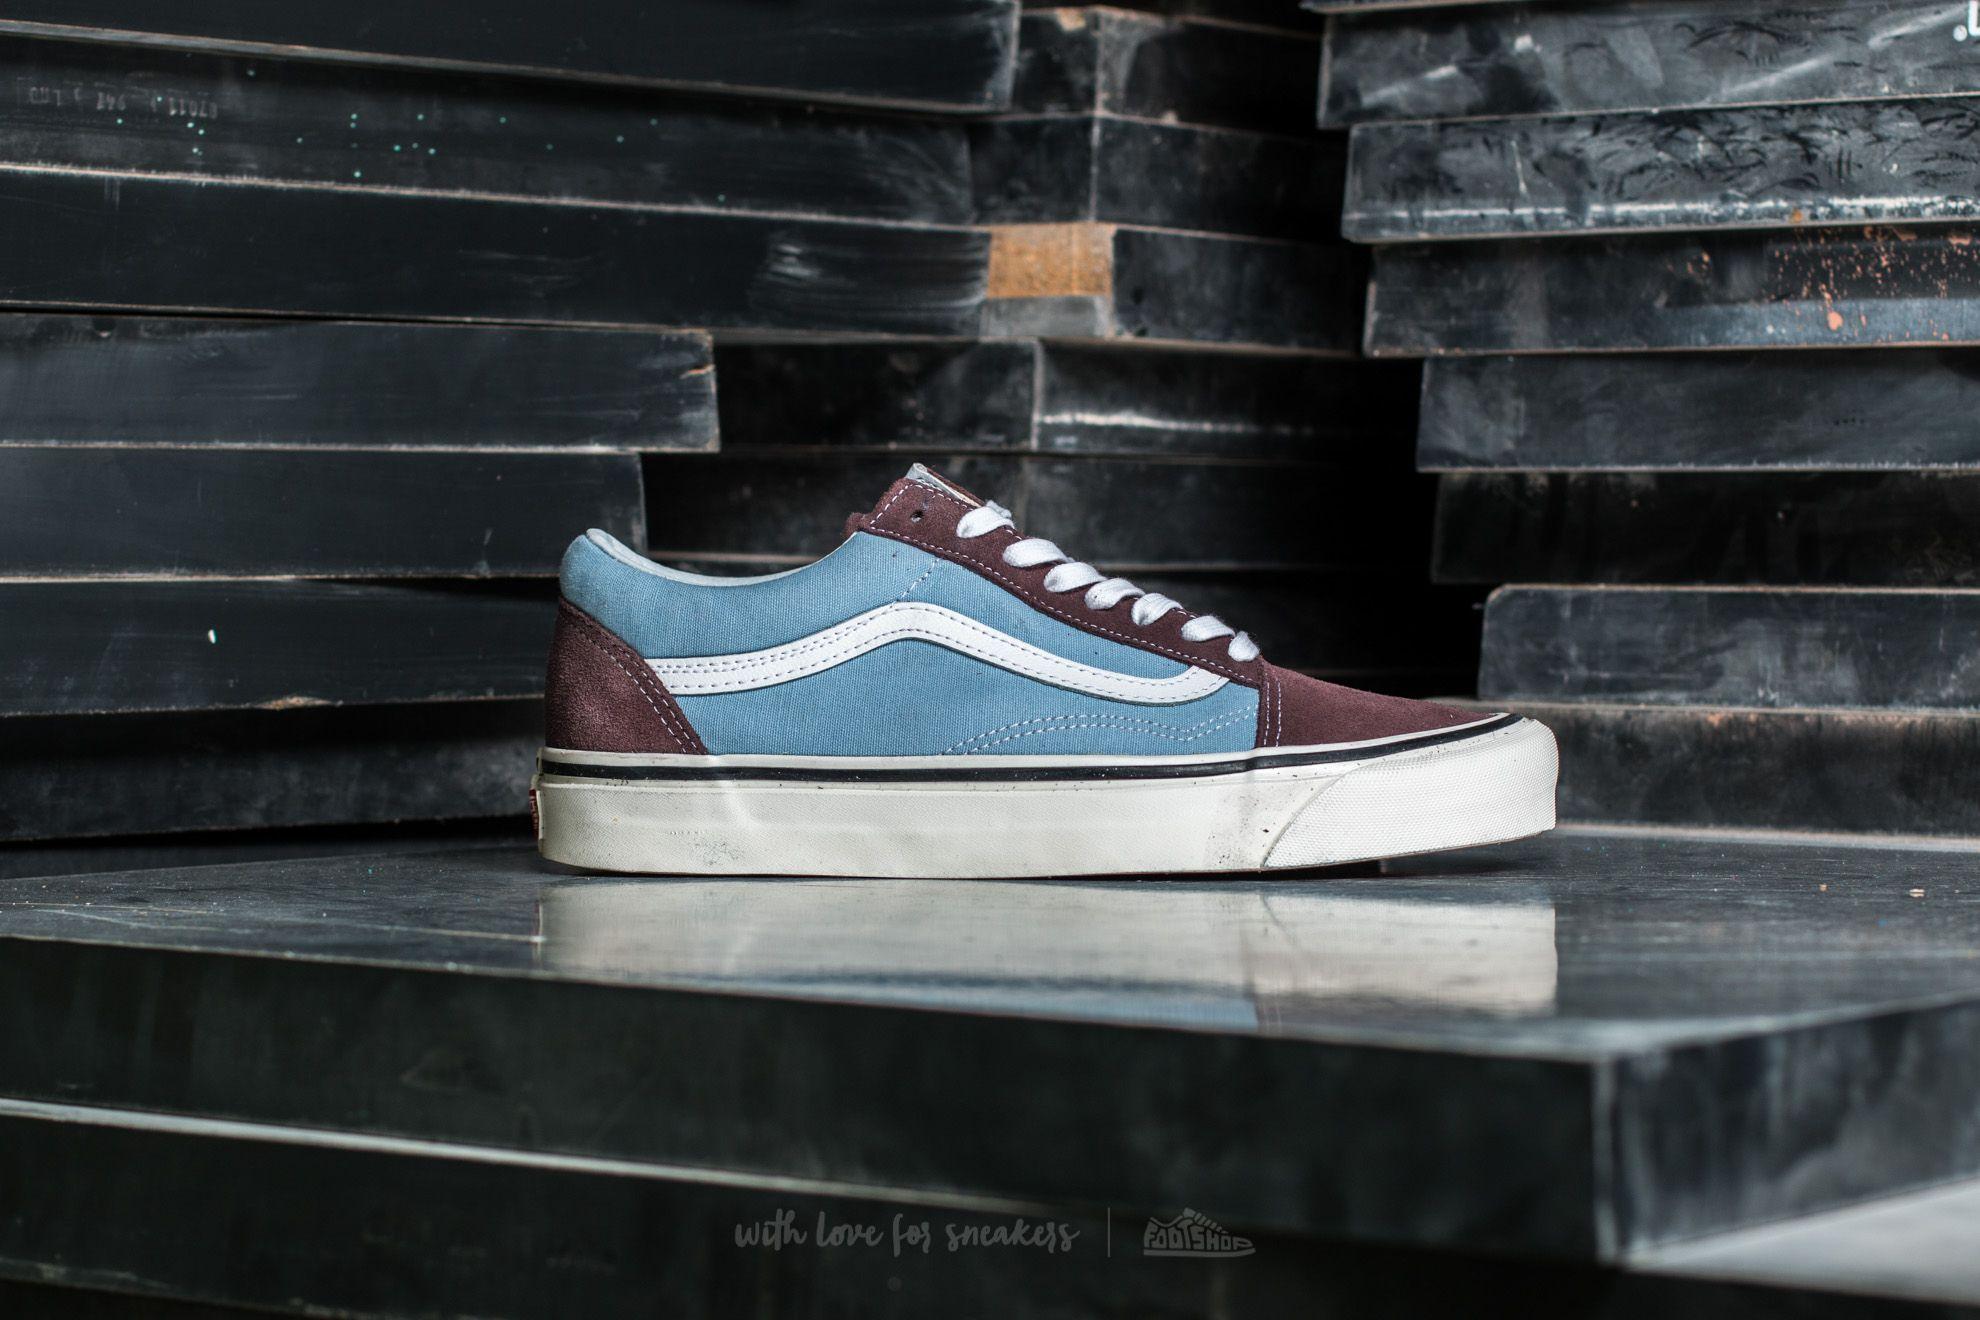 Vans Old Skool 36 DX (Anaheim Factory) Brown Light Blue | Footshop